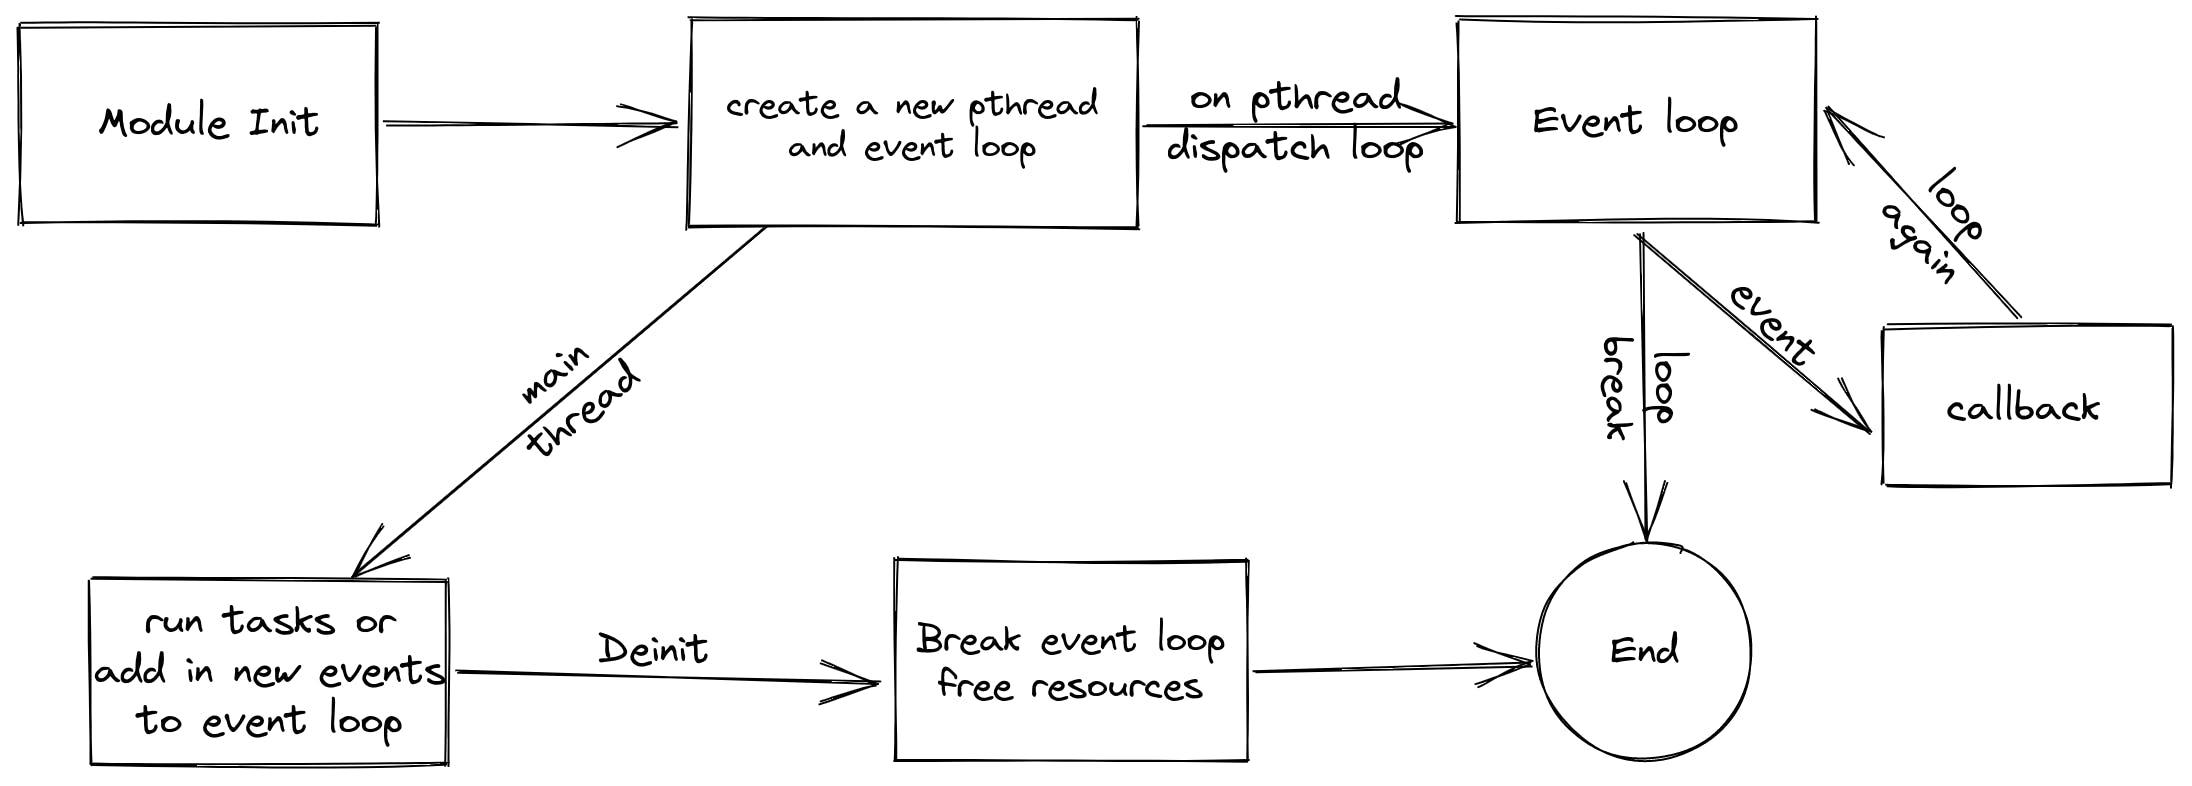 event loop.png